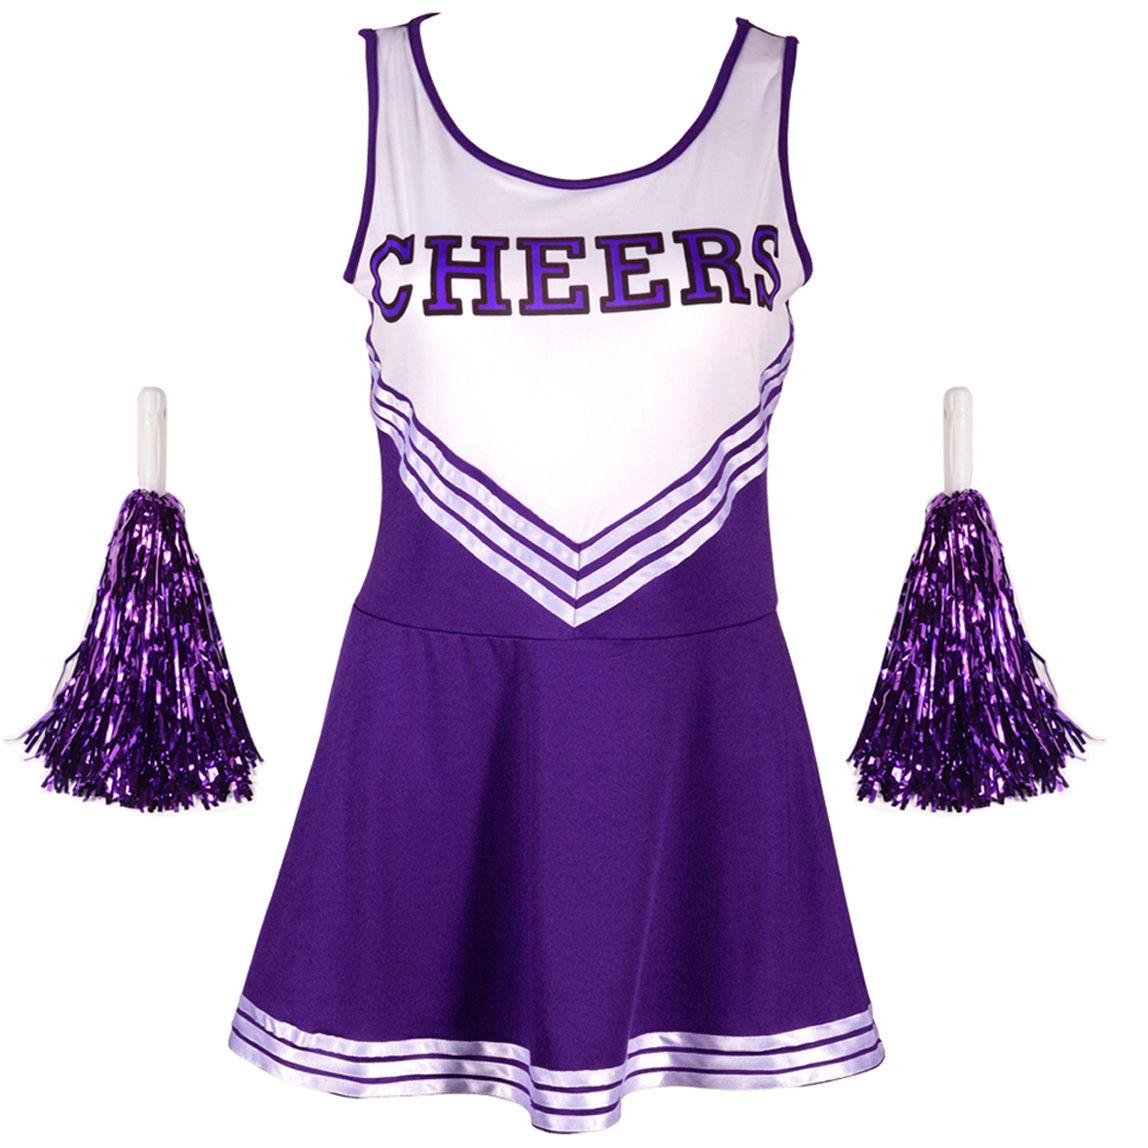 Hot cheerleading uniforms — img 12